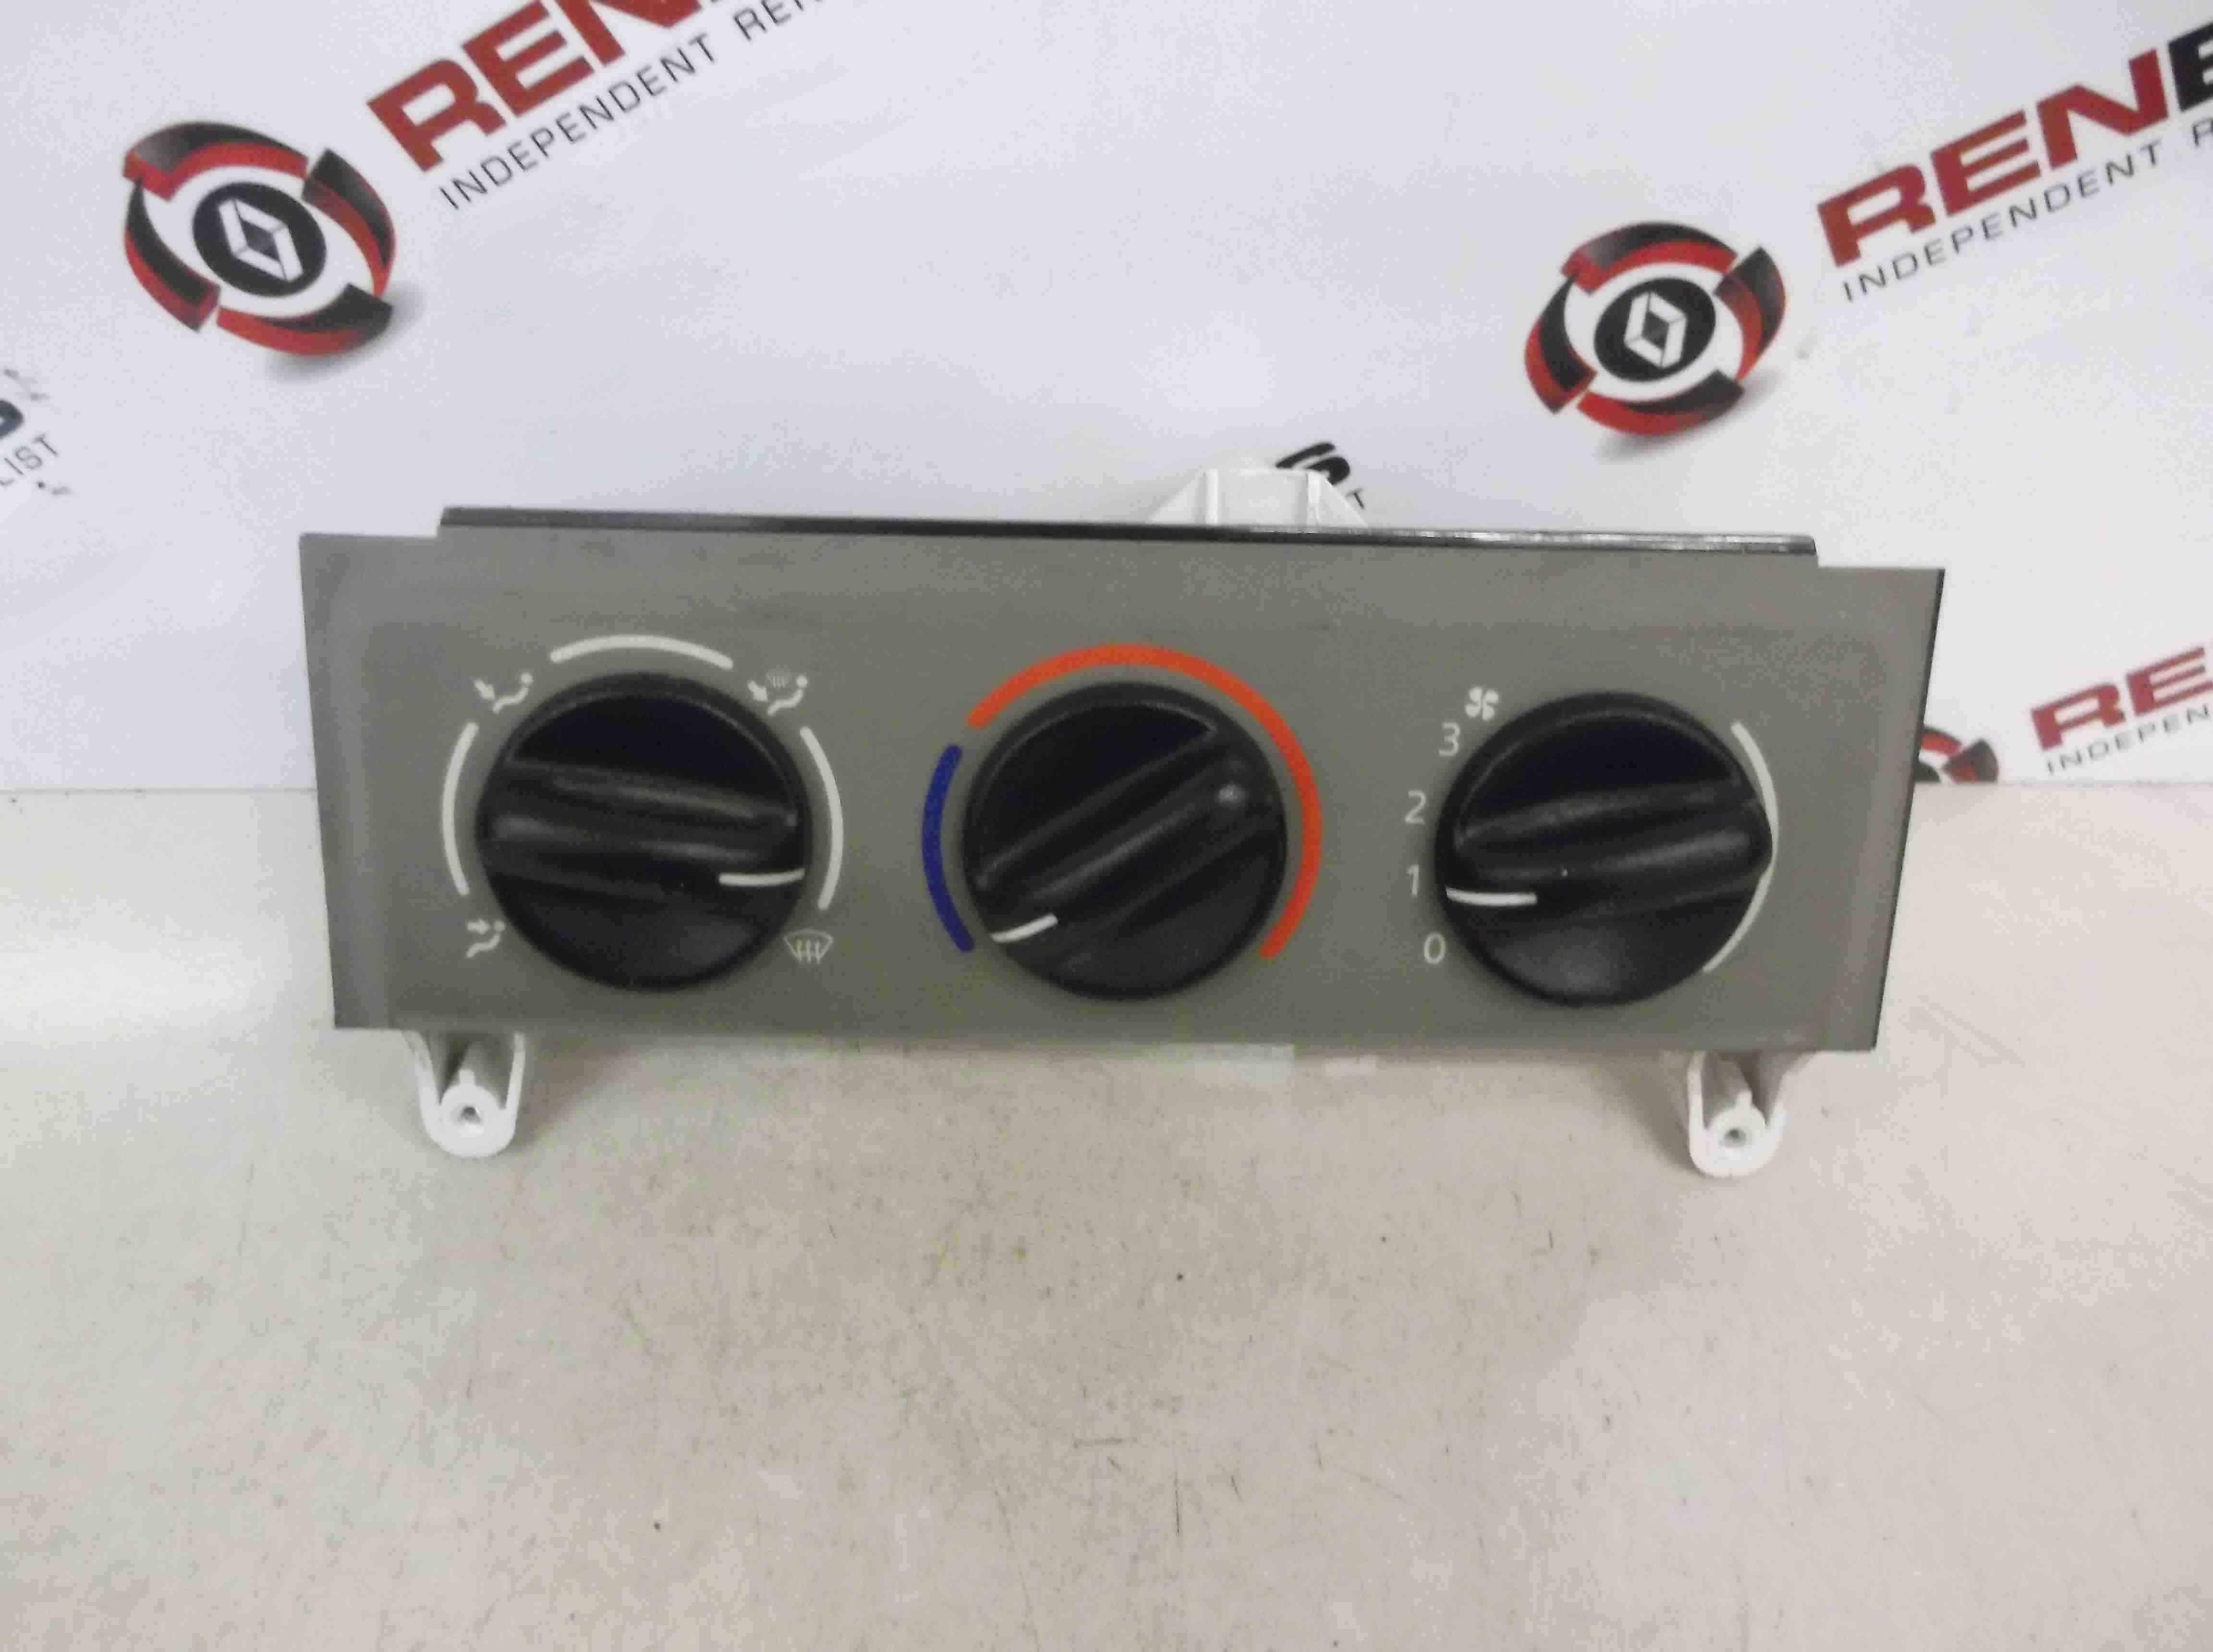 Renault Kangoo 2003-2007 Heater Controls Buttons Switch 12233